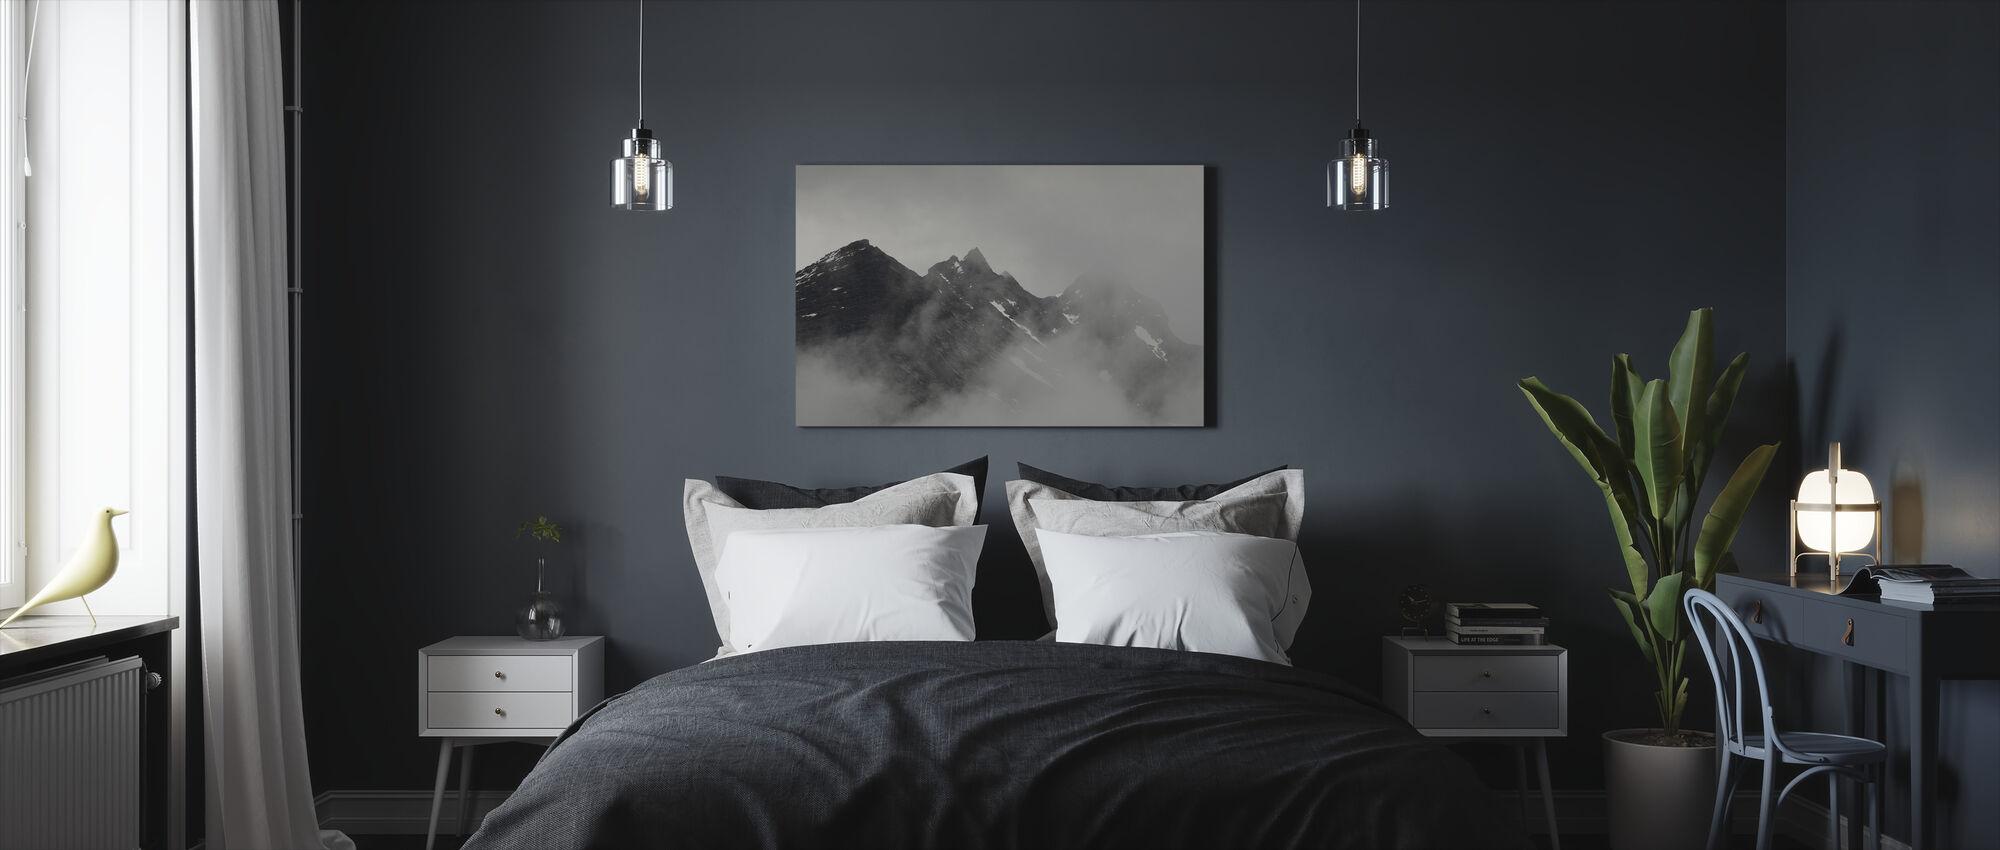 Vettisfossen Mountains, Norway - Canvas print - Bedroom